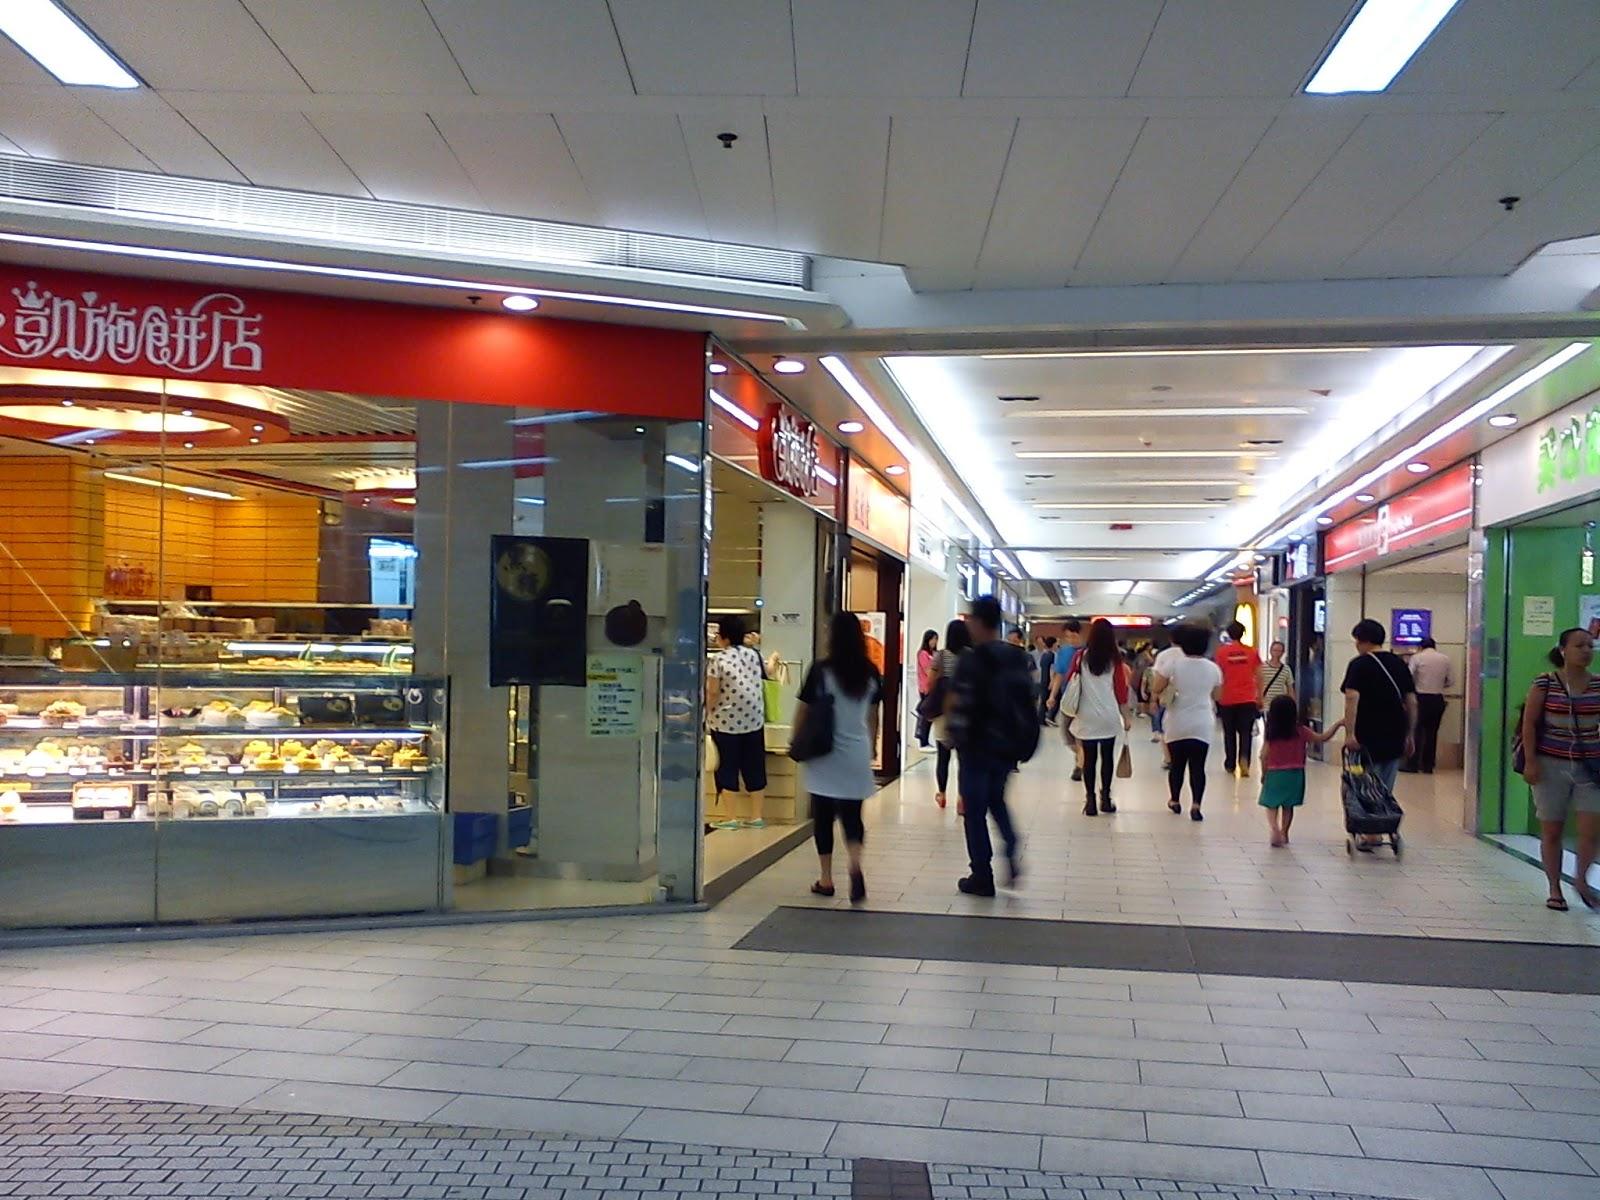 Grassroots O2: 巡視業務.領匯.彩明商場 @2013-07-27